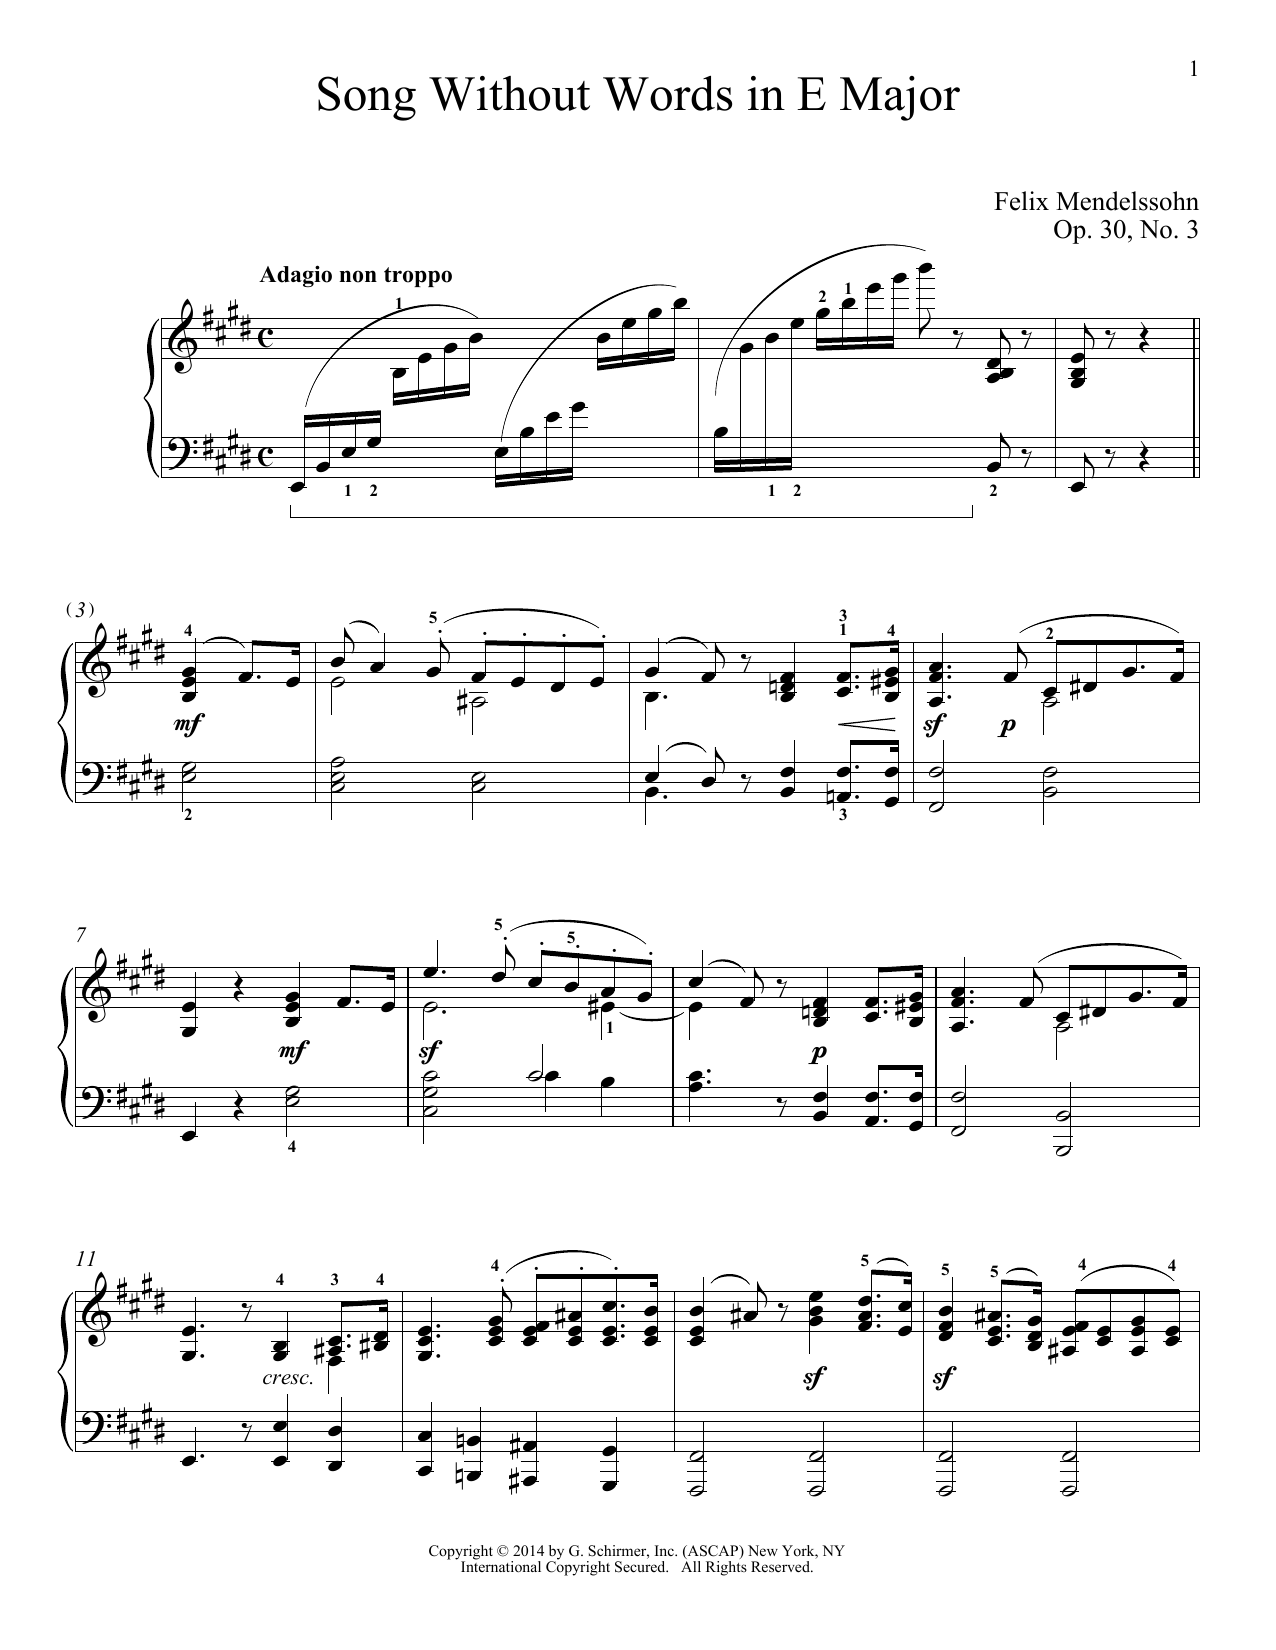 Partition piano Song Without Words In E Major, Op. 30, No. 3 de Felix Mendelssohn - Piano Solo